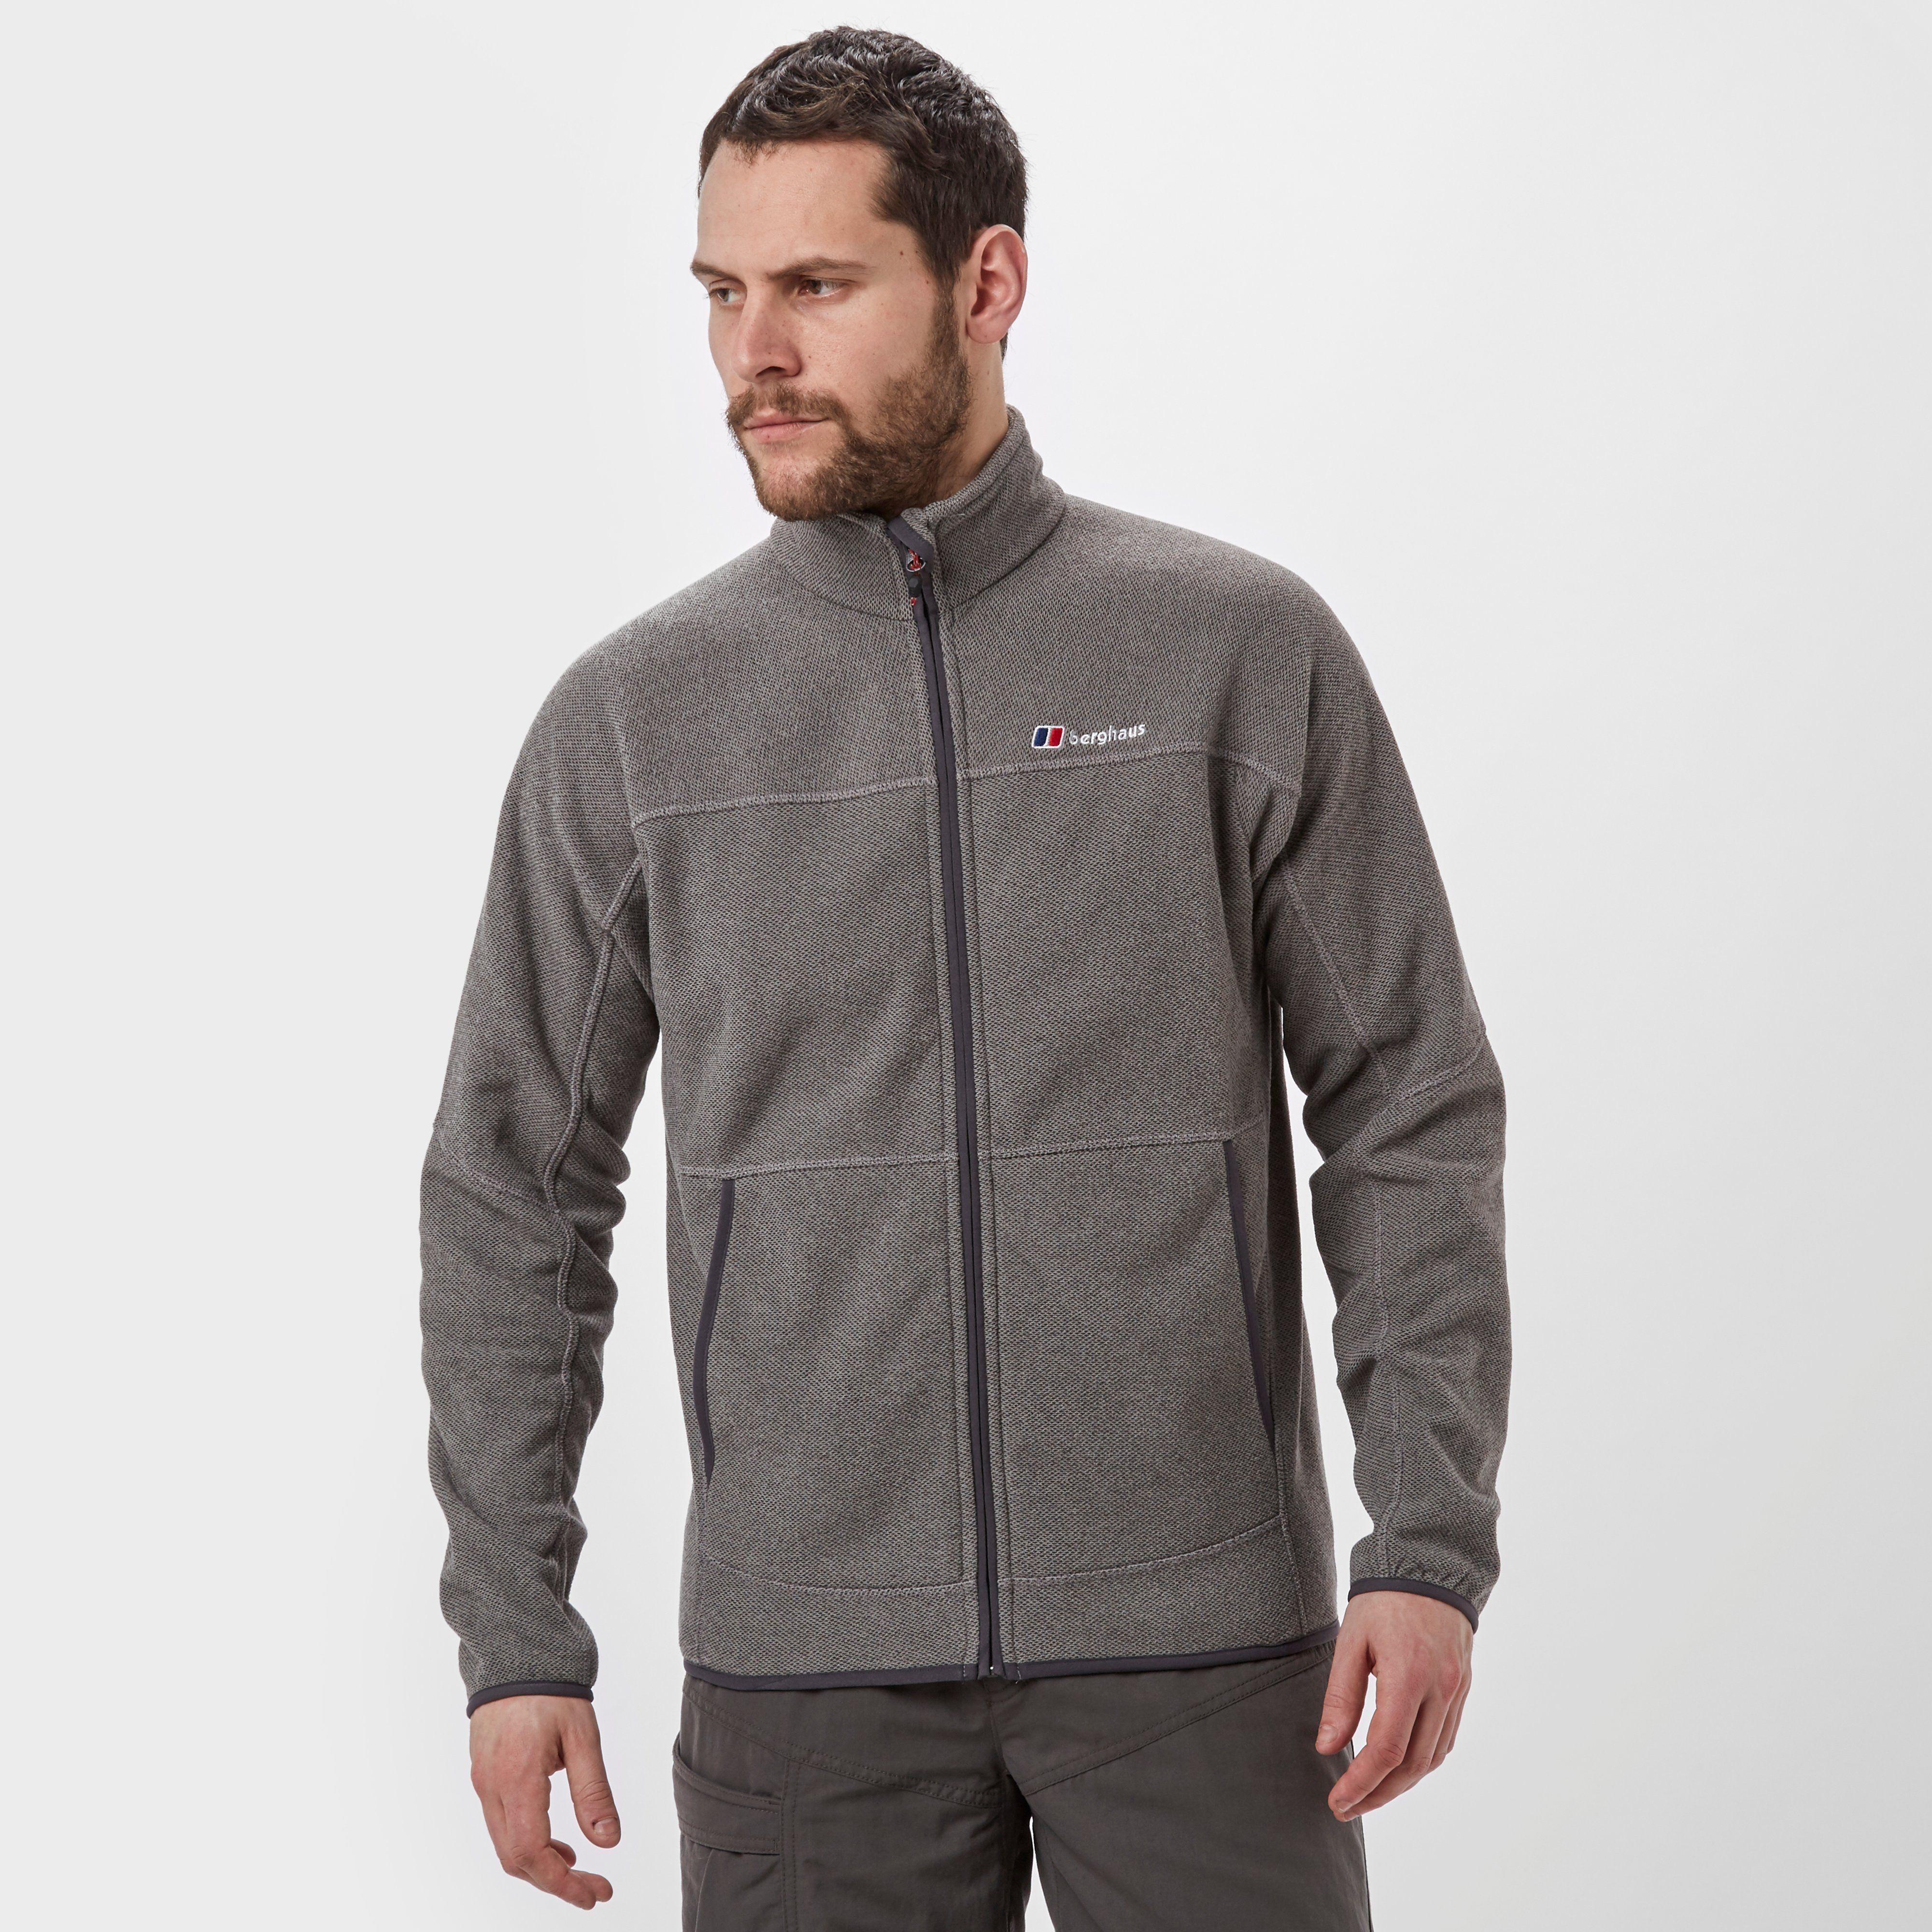 BERGHAUS Men's Stainton Full-Zip Fleece